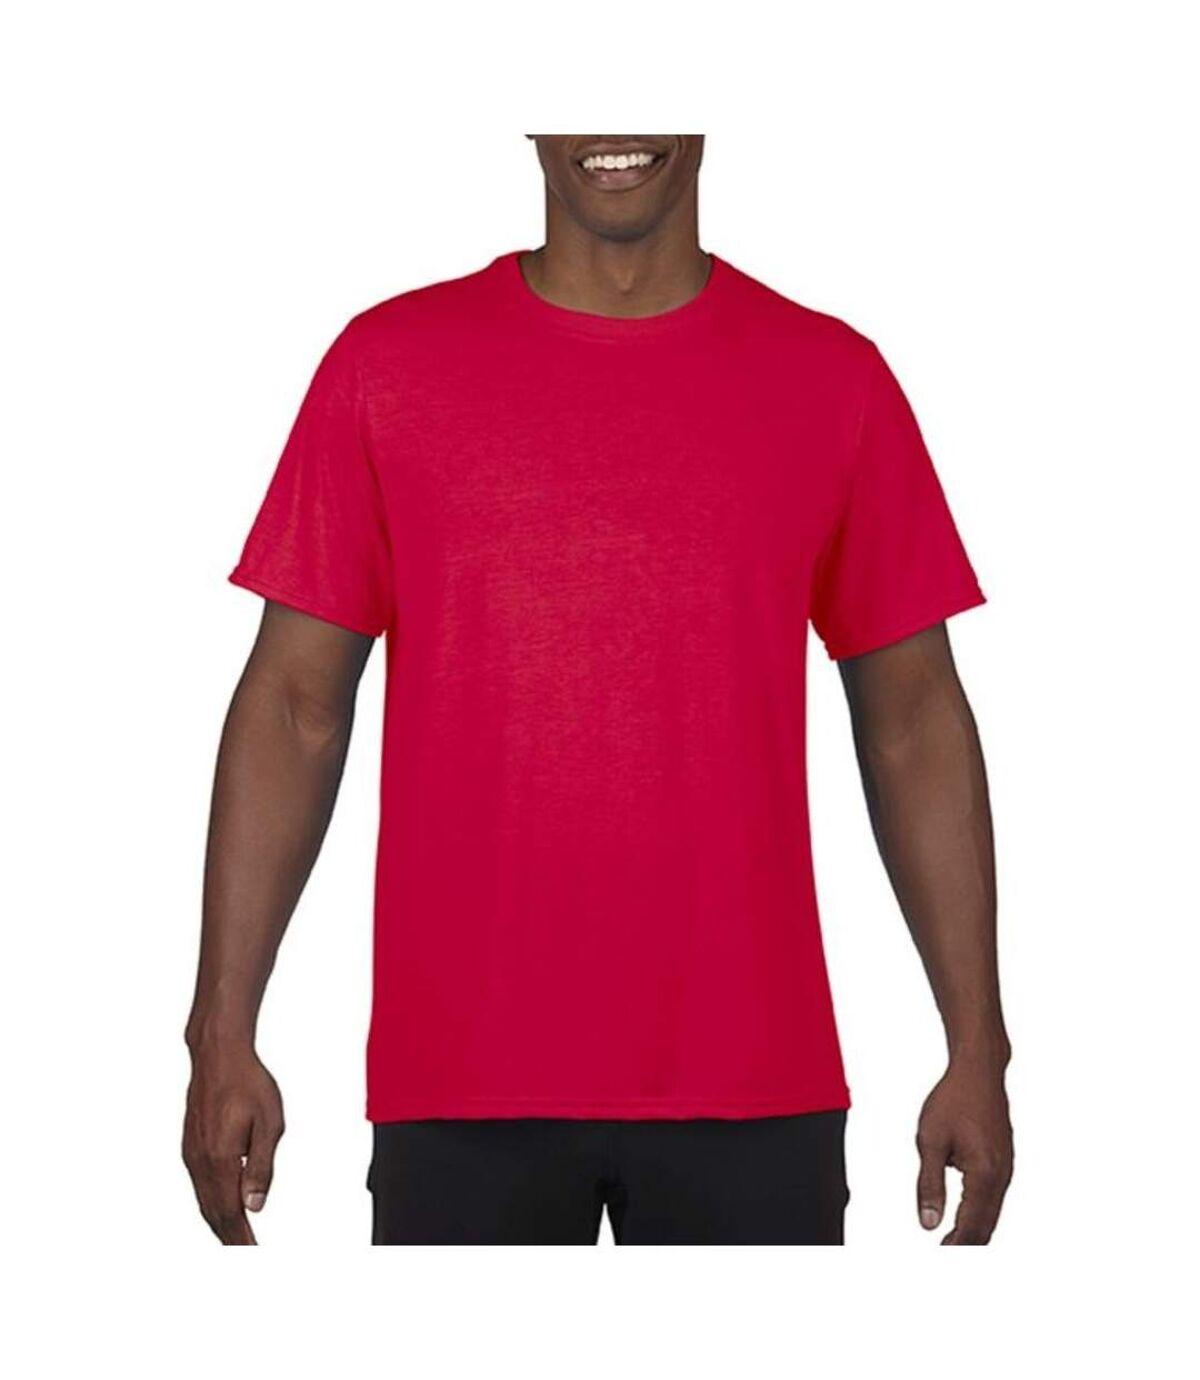 Gildan Mens Performance Core Short Sleeve T-Shirt (Sport Scarlet Red) - UTPC2851